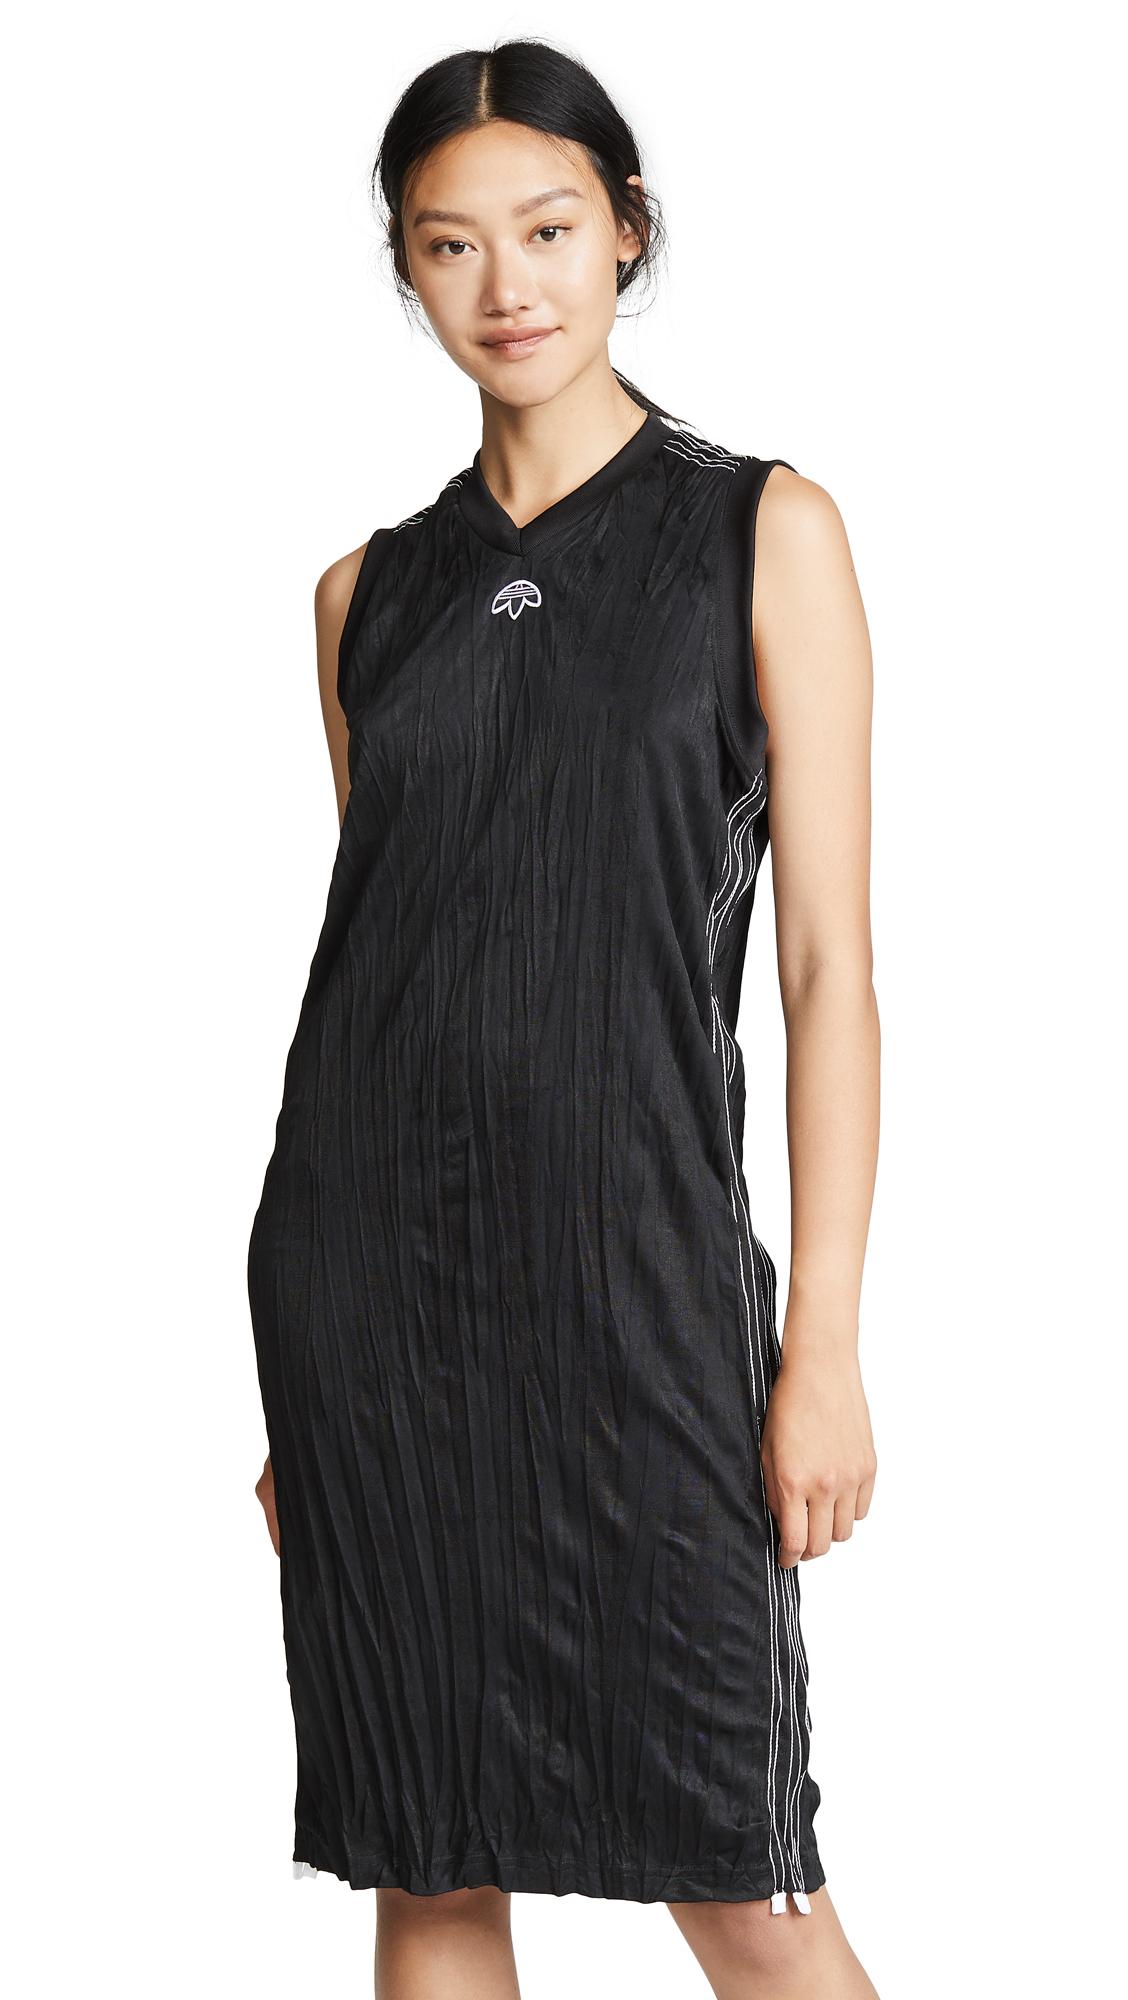 adidas Originals by Alexander Wang Tank Dress In Black/White